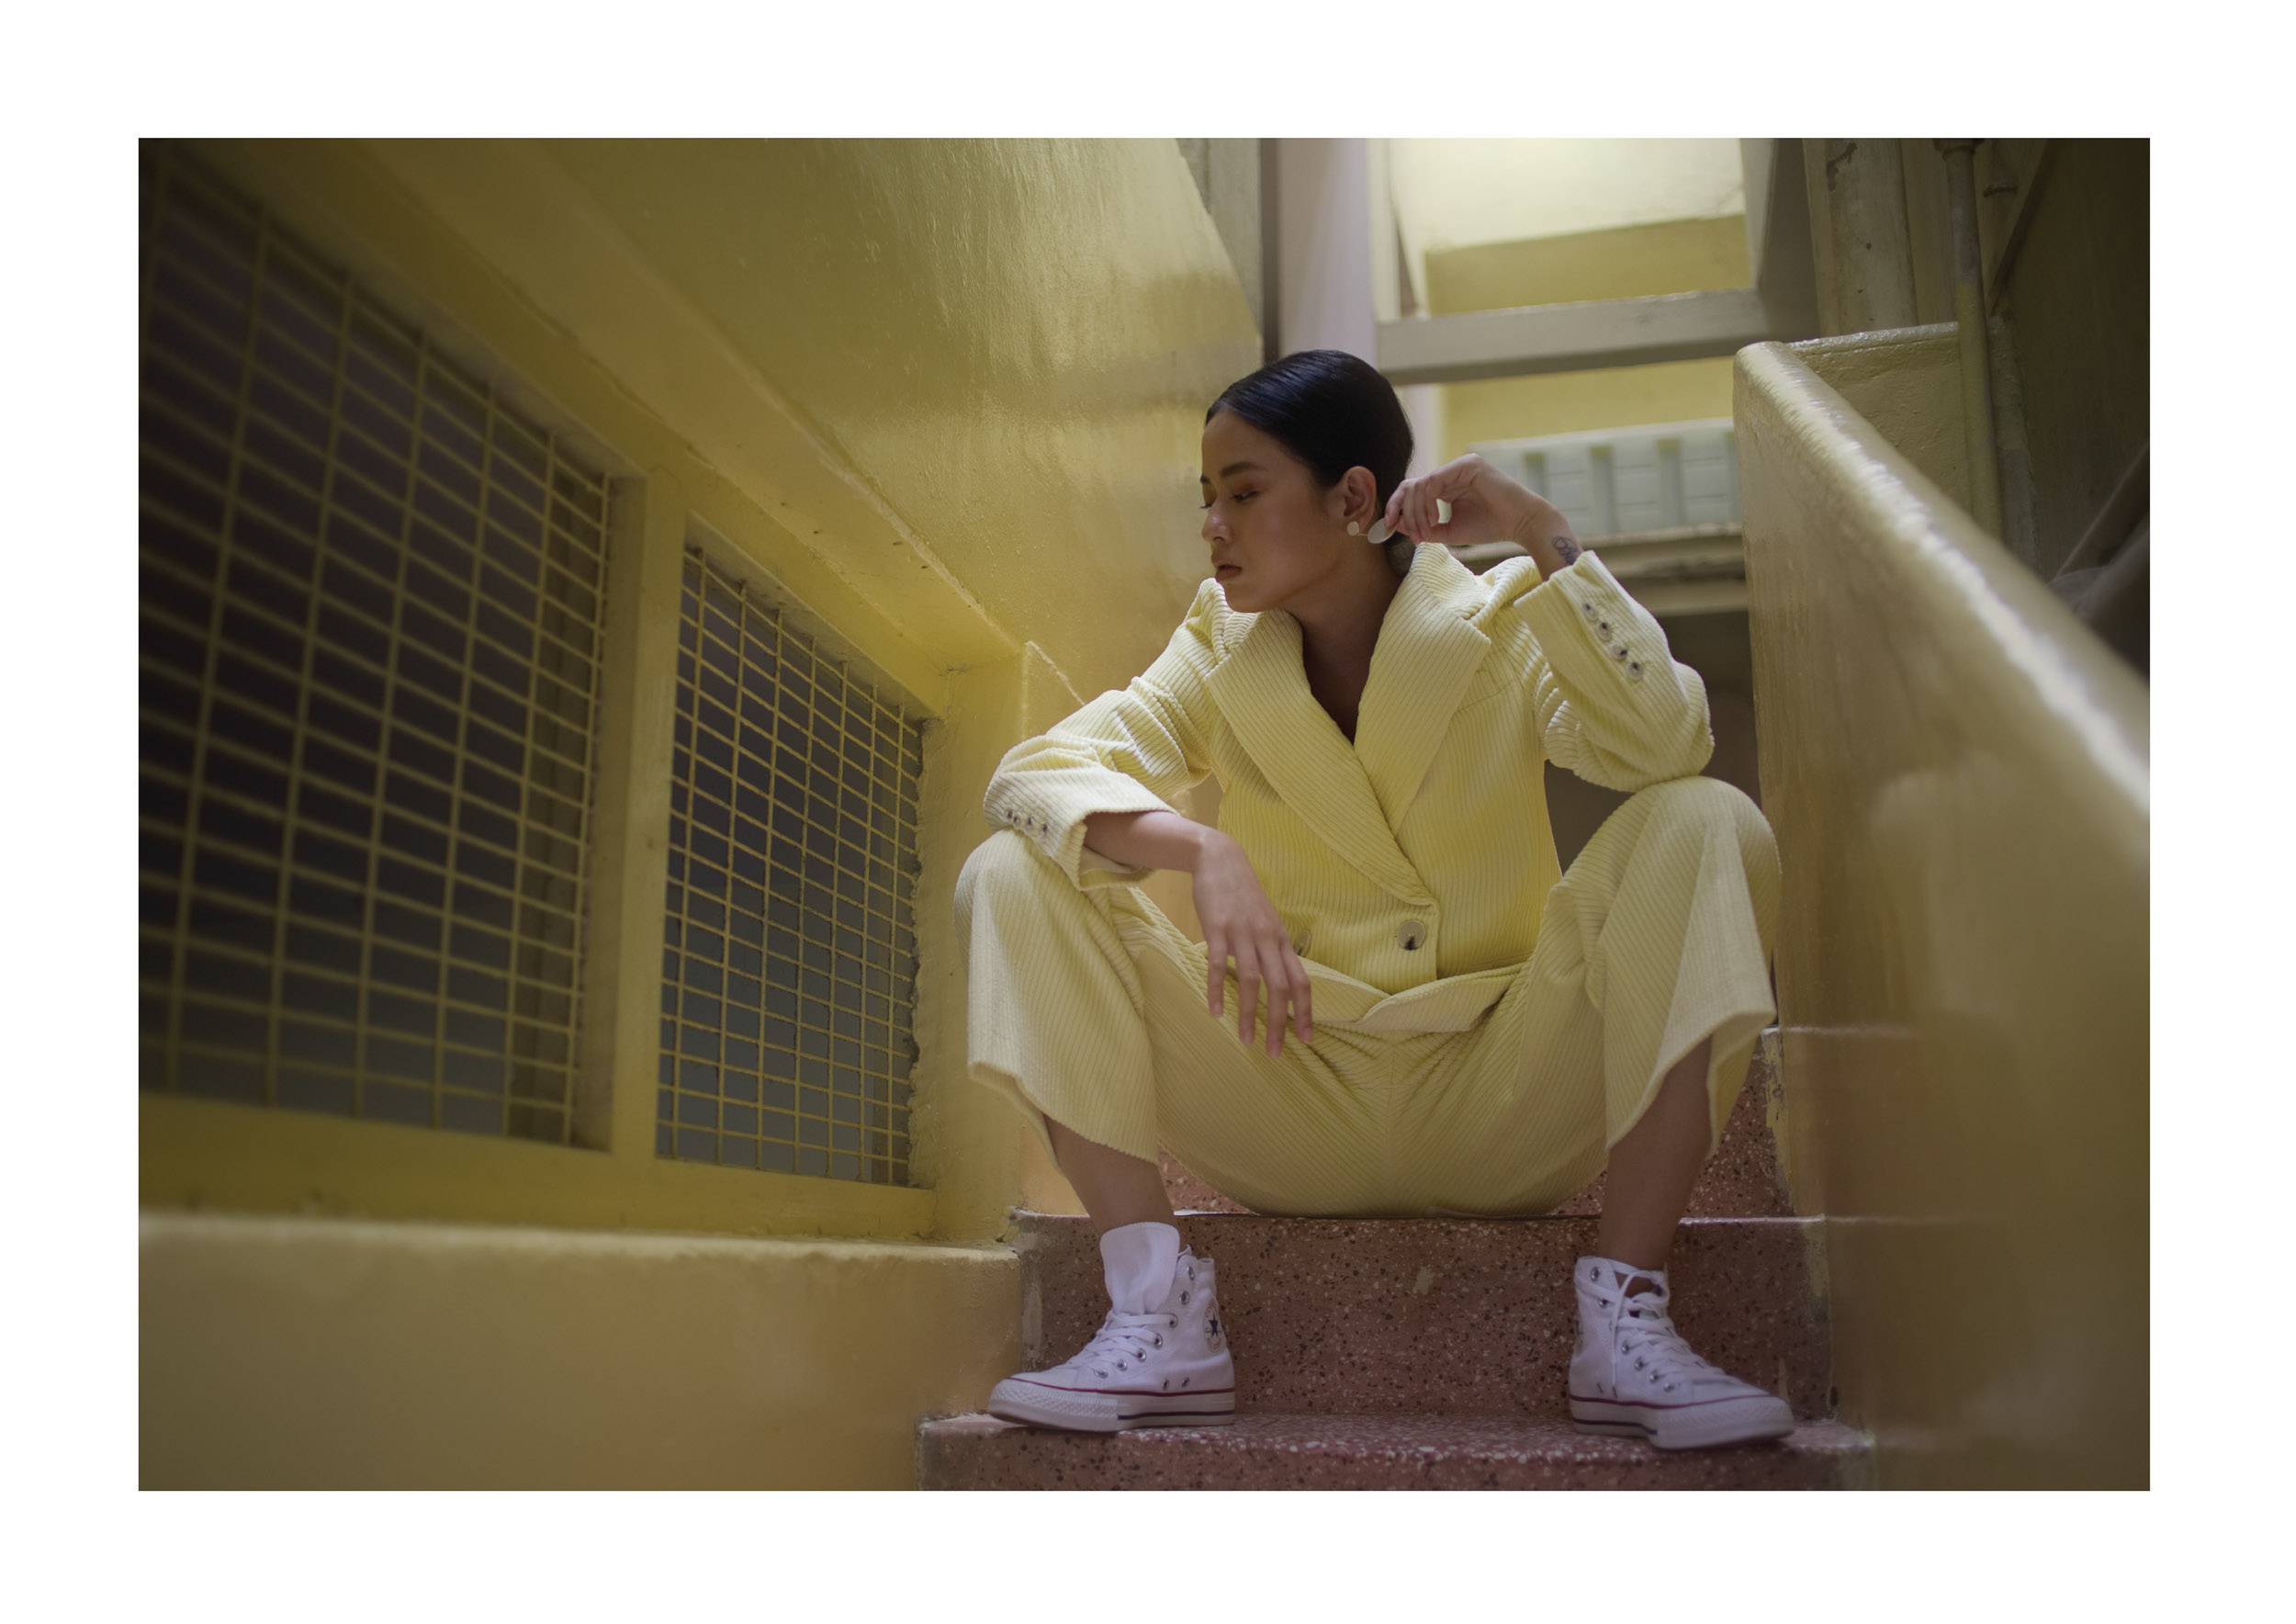 Sindhur_Photography_Fashion_StopTheExcuses-6.JPG